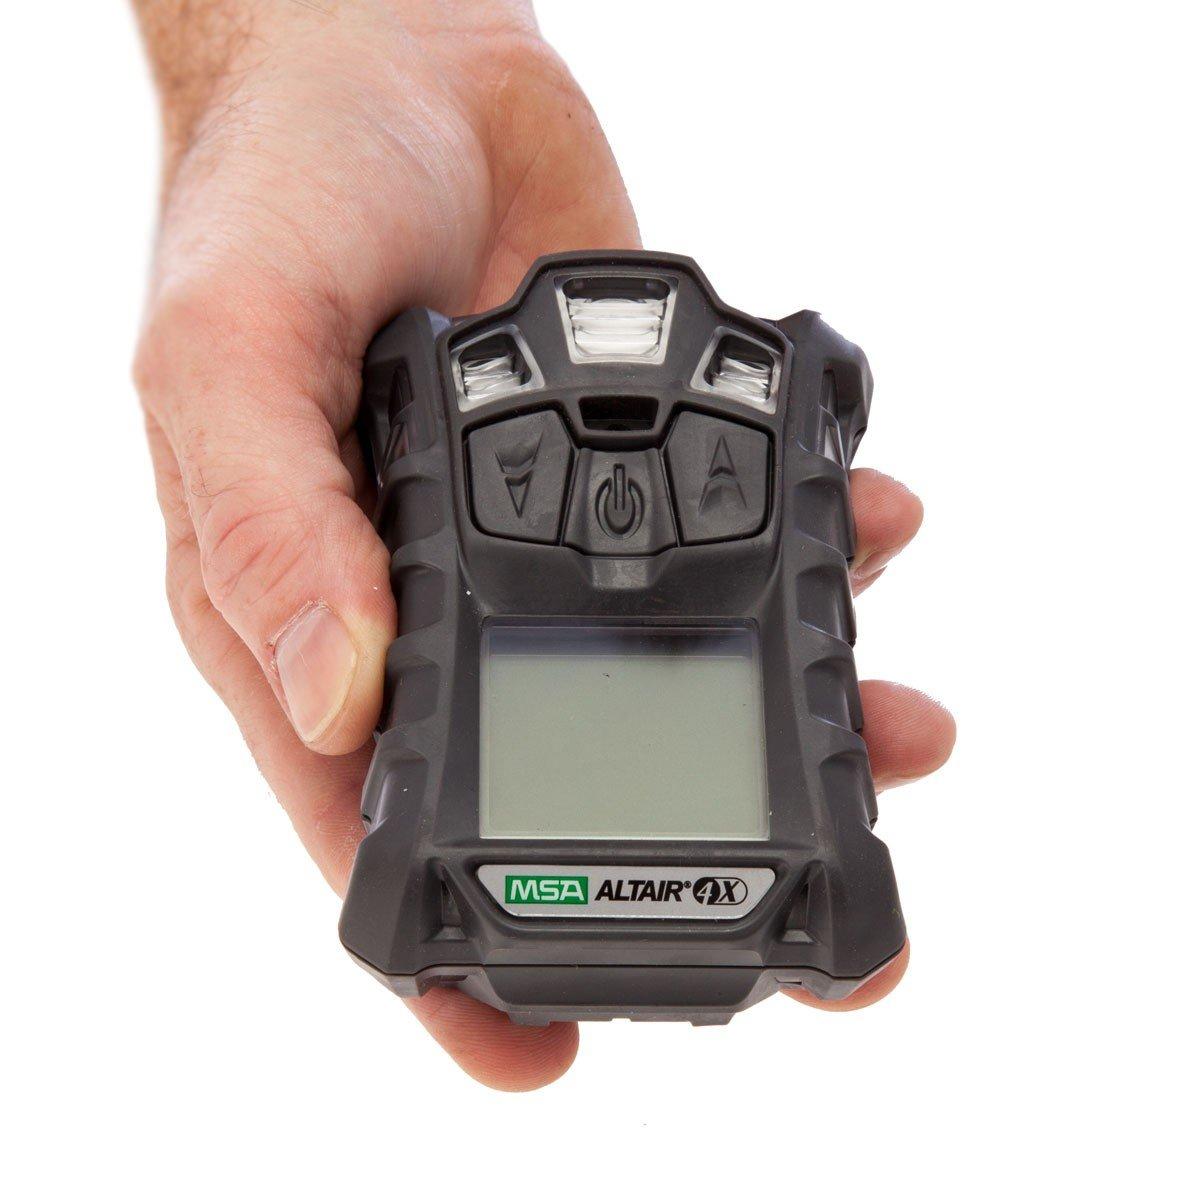 MSA ALTAIR 4X Gas Detector LEL/O2/CO/H2S